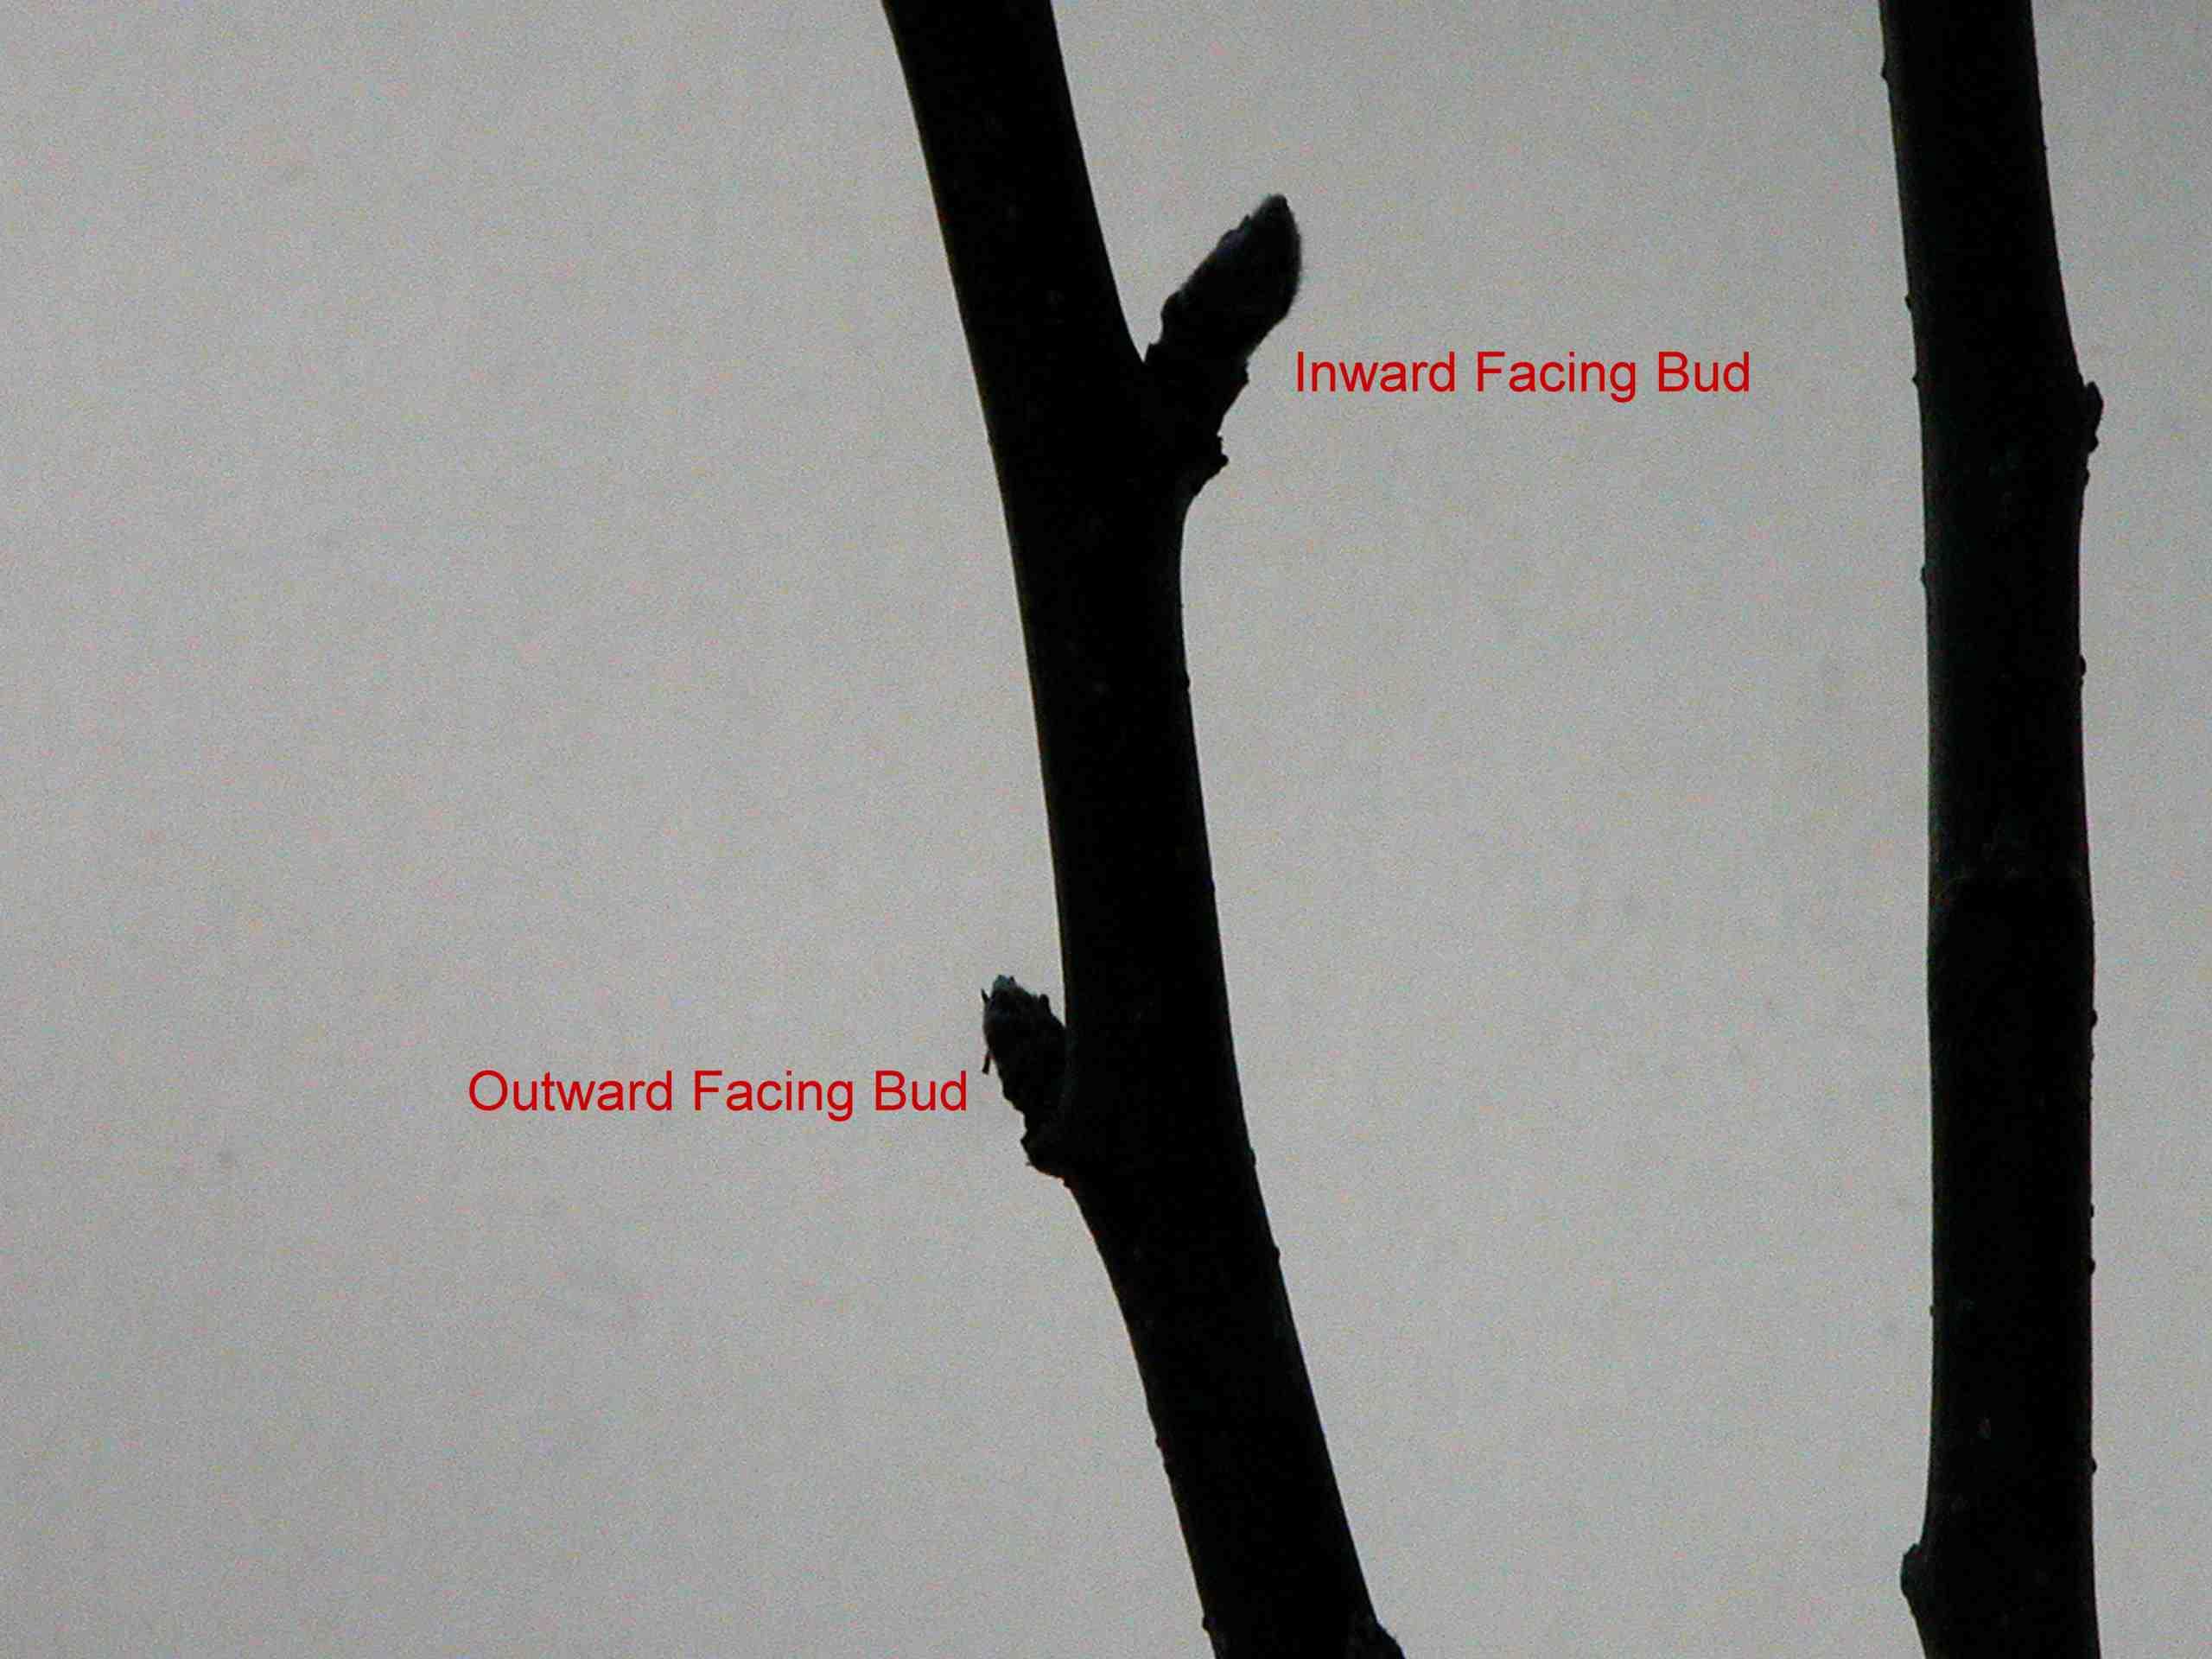 Outward facing bud on apple tree